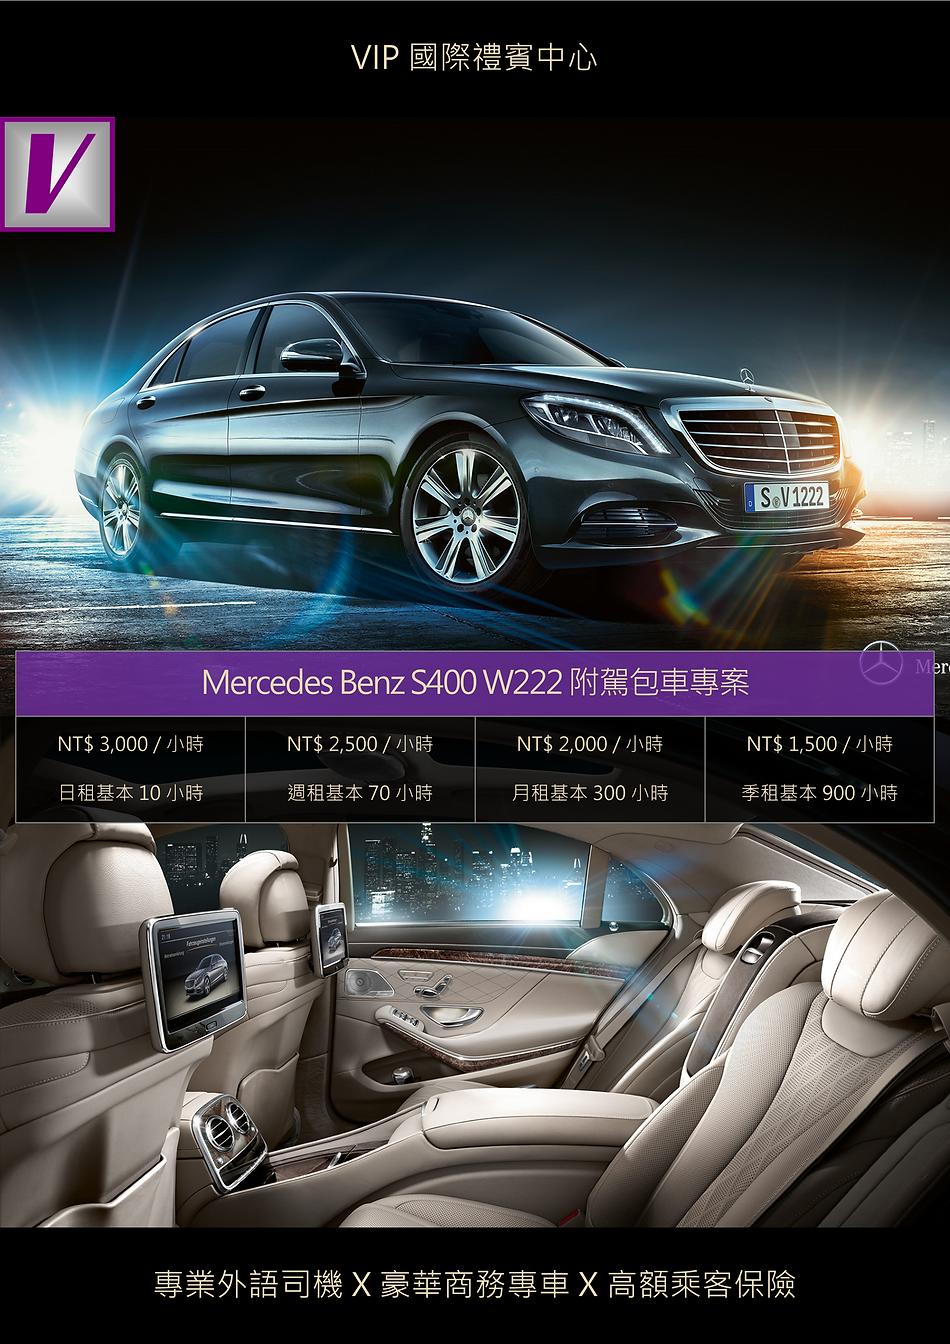 VIP國際禮賓中心 MERCEDES BENZ S400 W222 附駕包車專案 DM.png